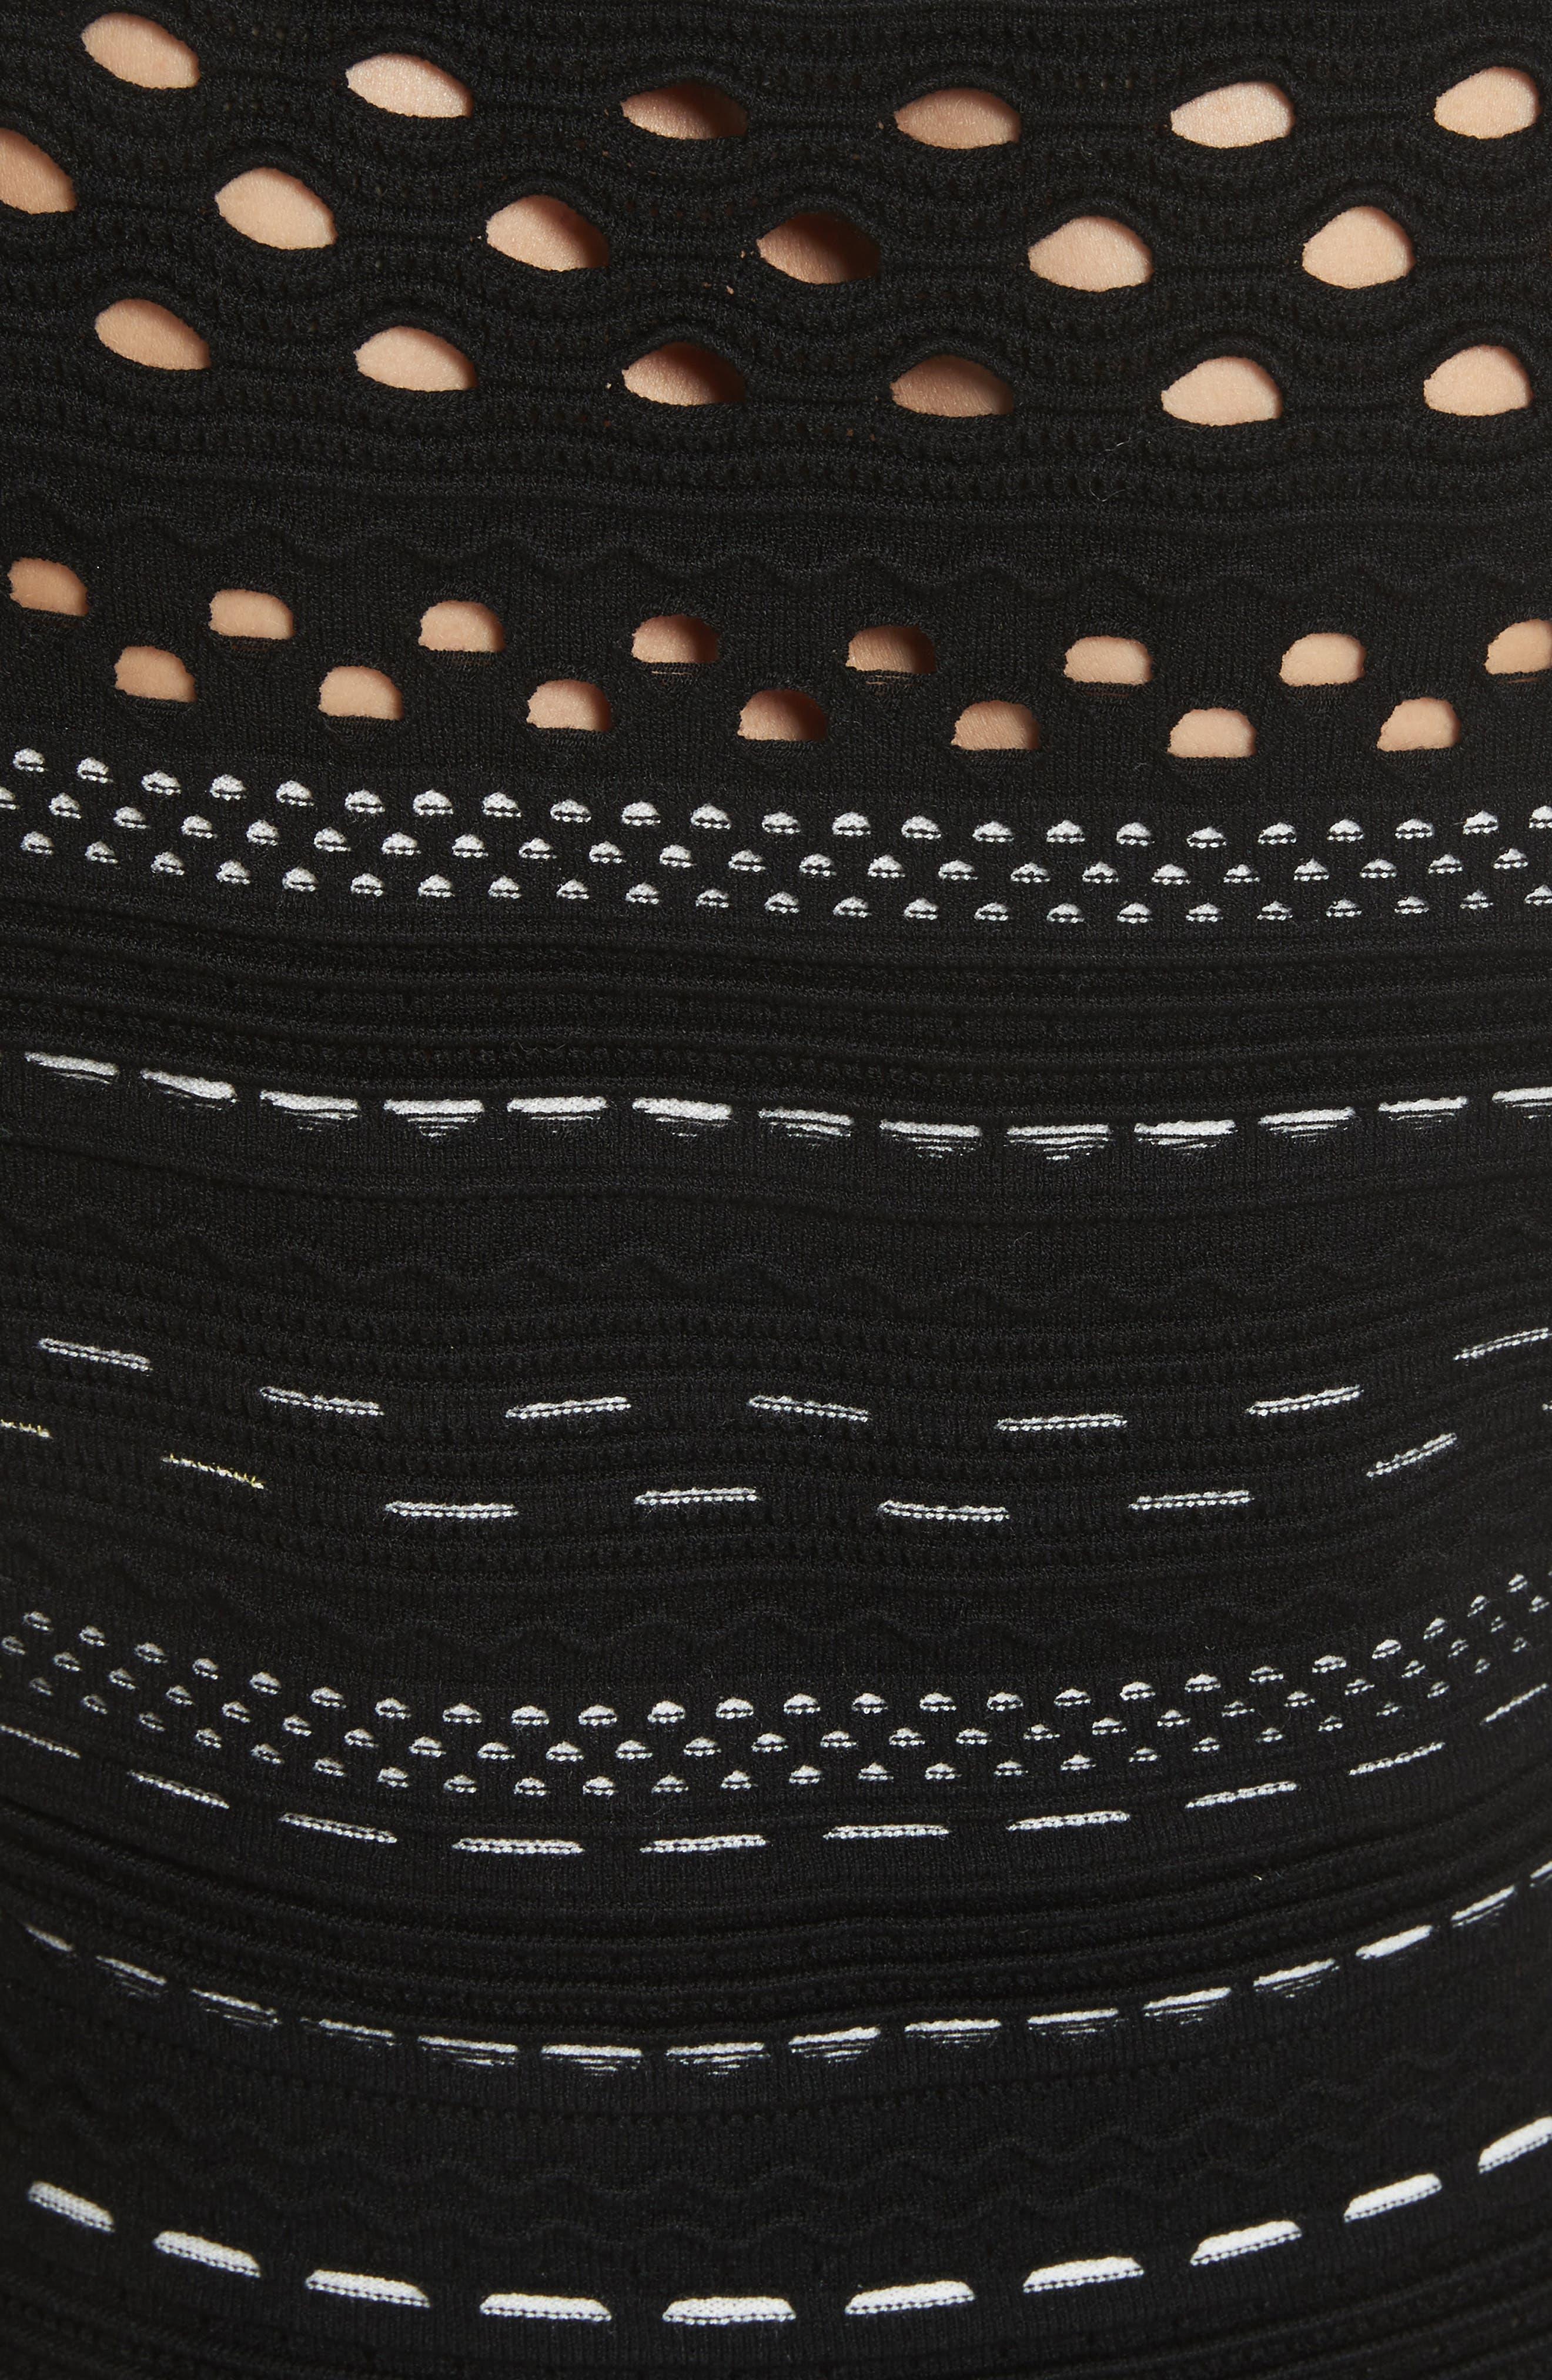 Lace Knit Top,                             Alternate thumbnail 5, color,                             Black/ White